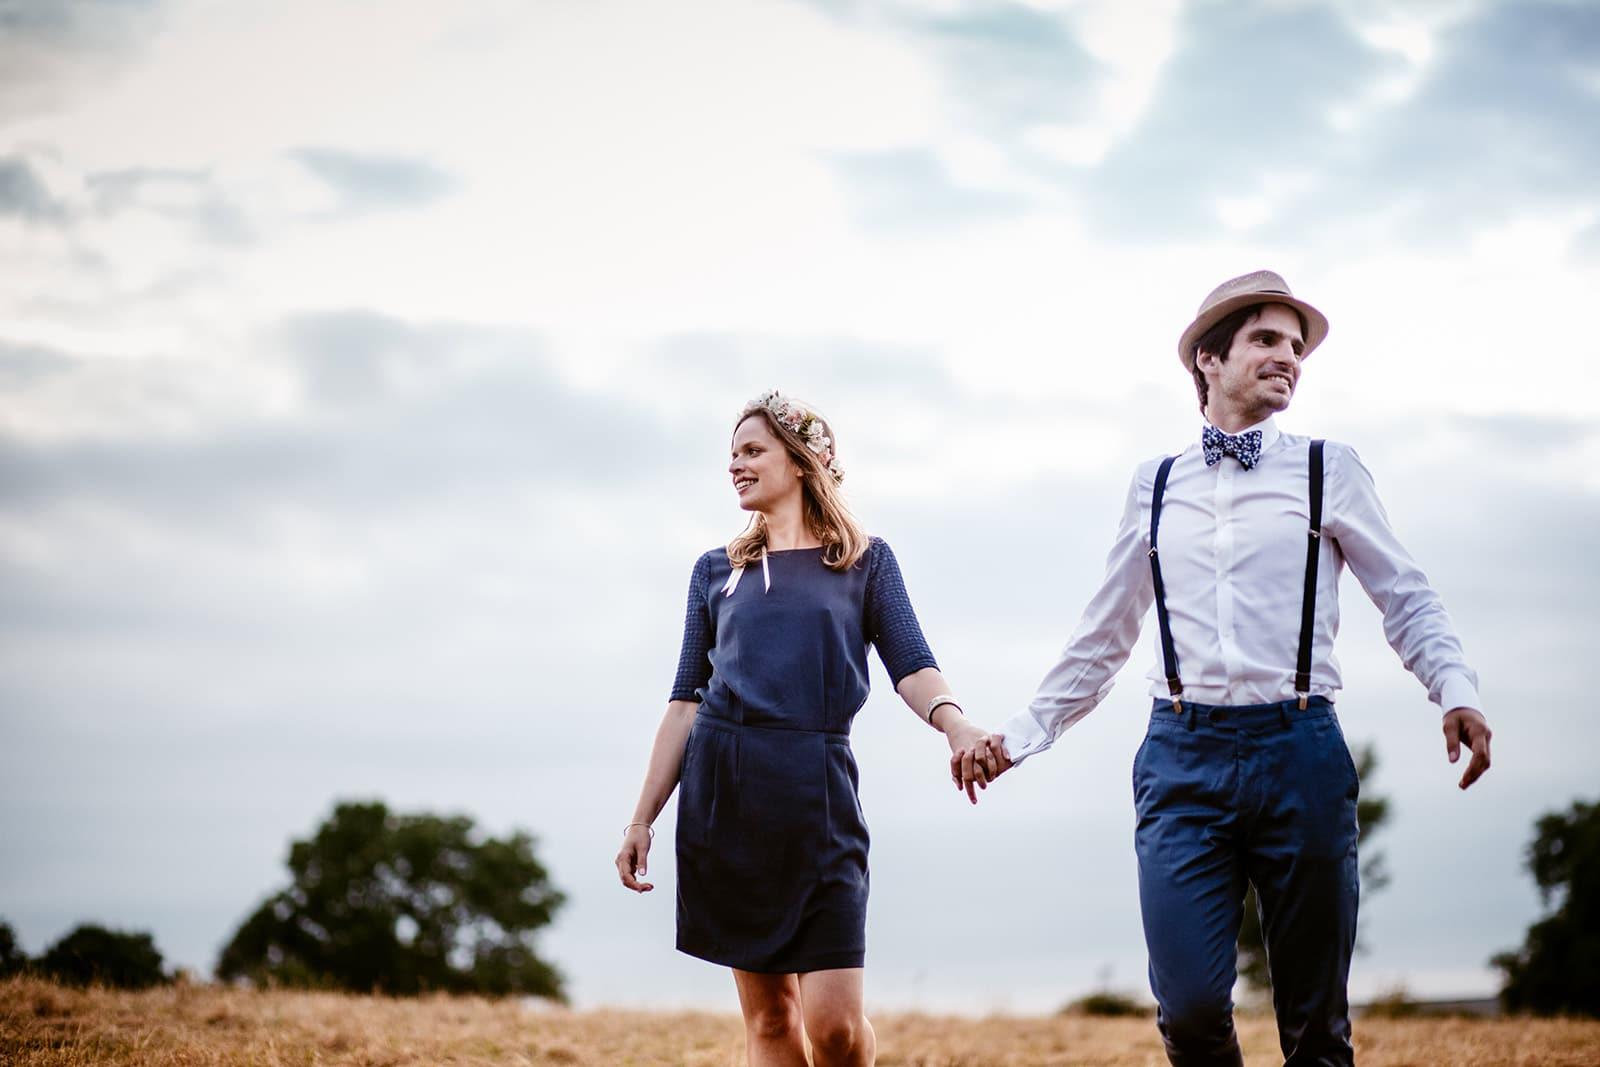 Photographe de mariage alternatif Photographe de mariage champetre Bourgogne Castille ALMA Photographe mariage